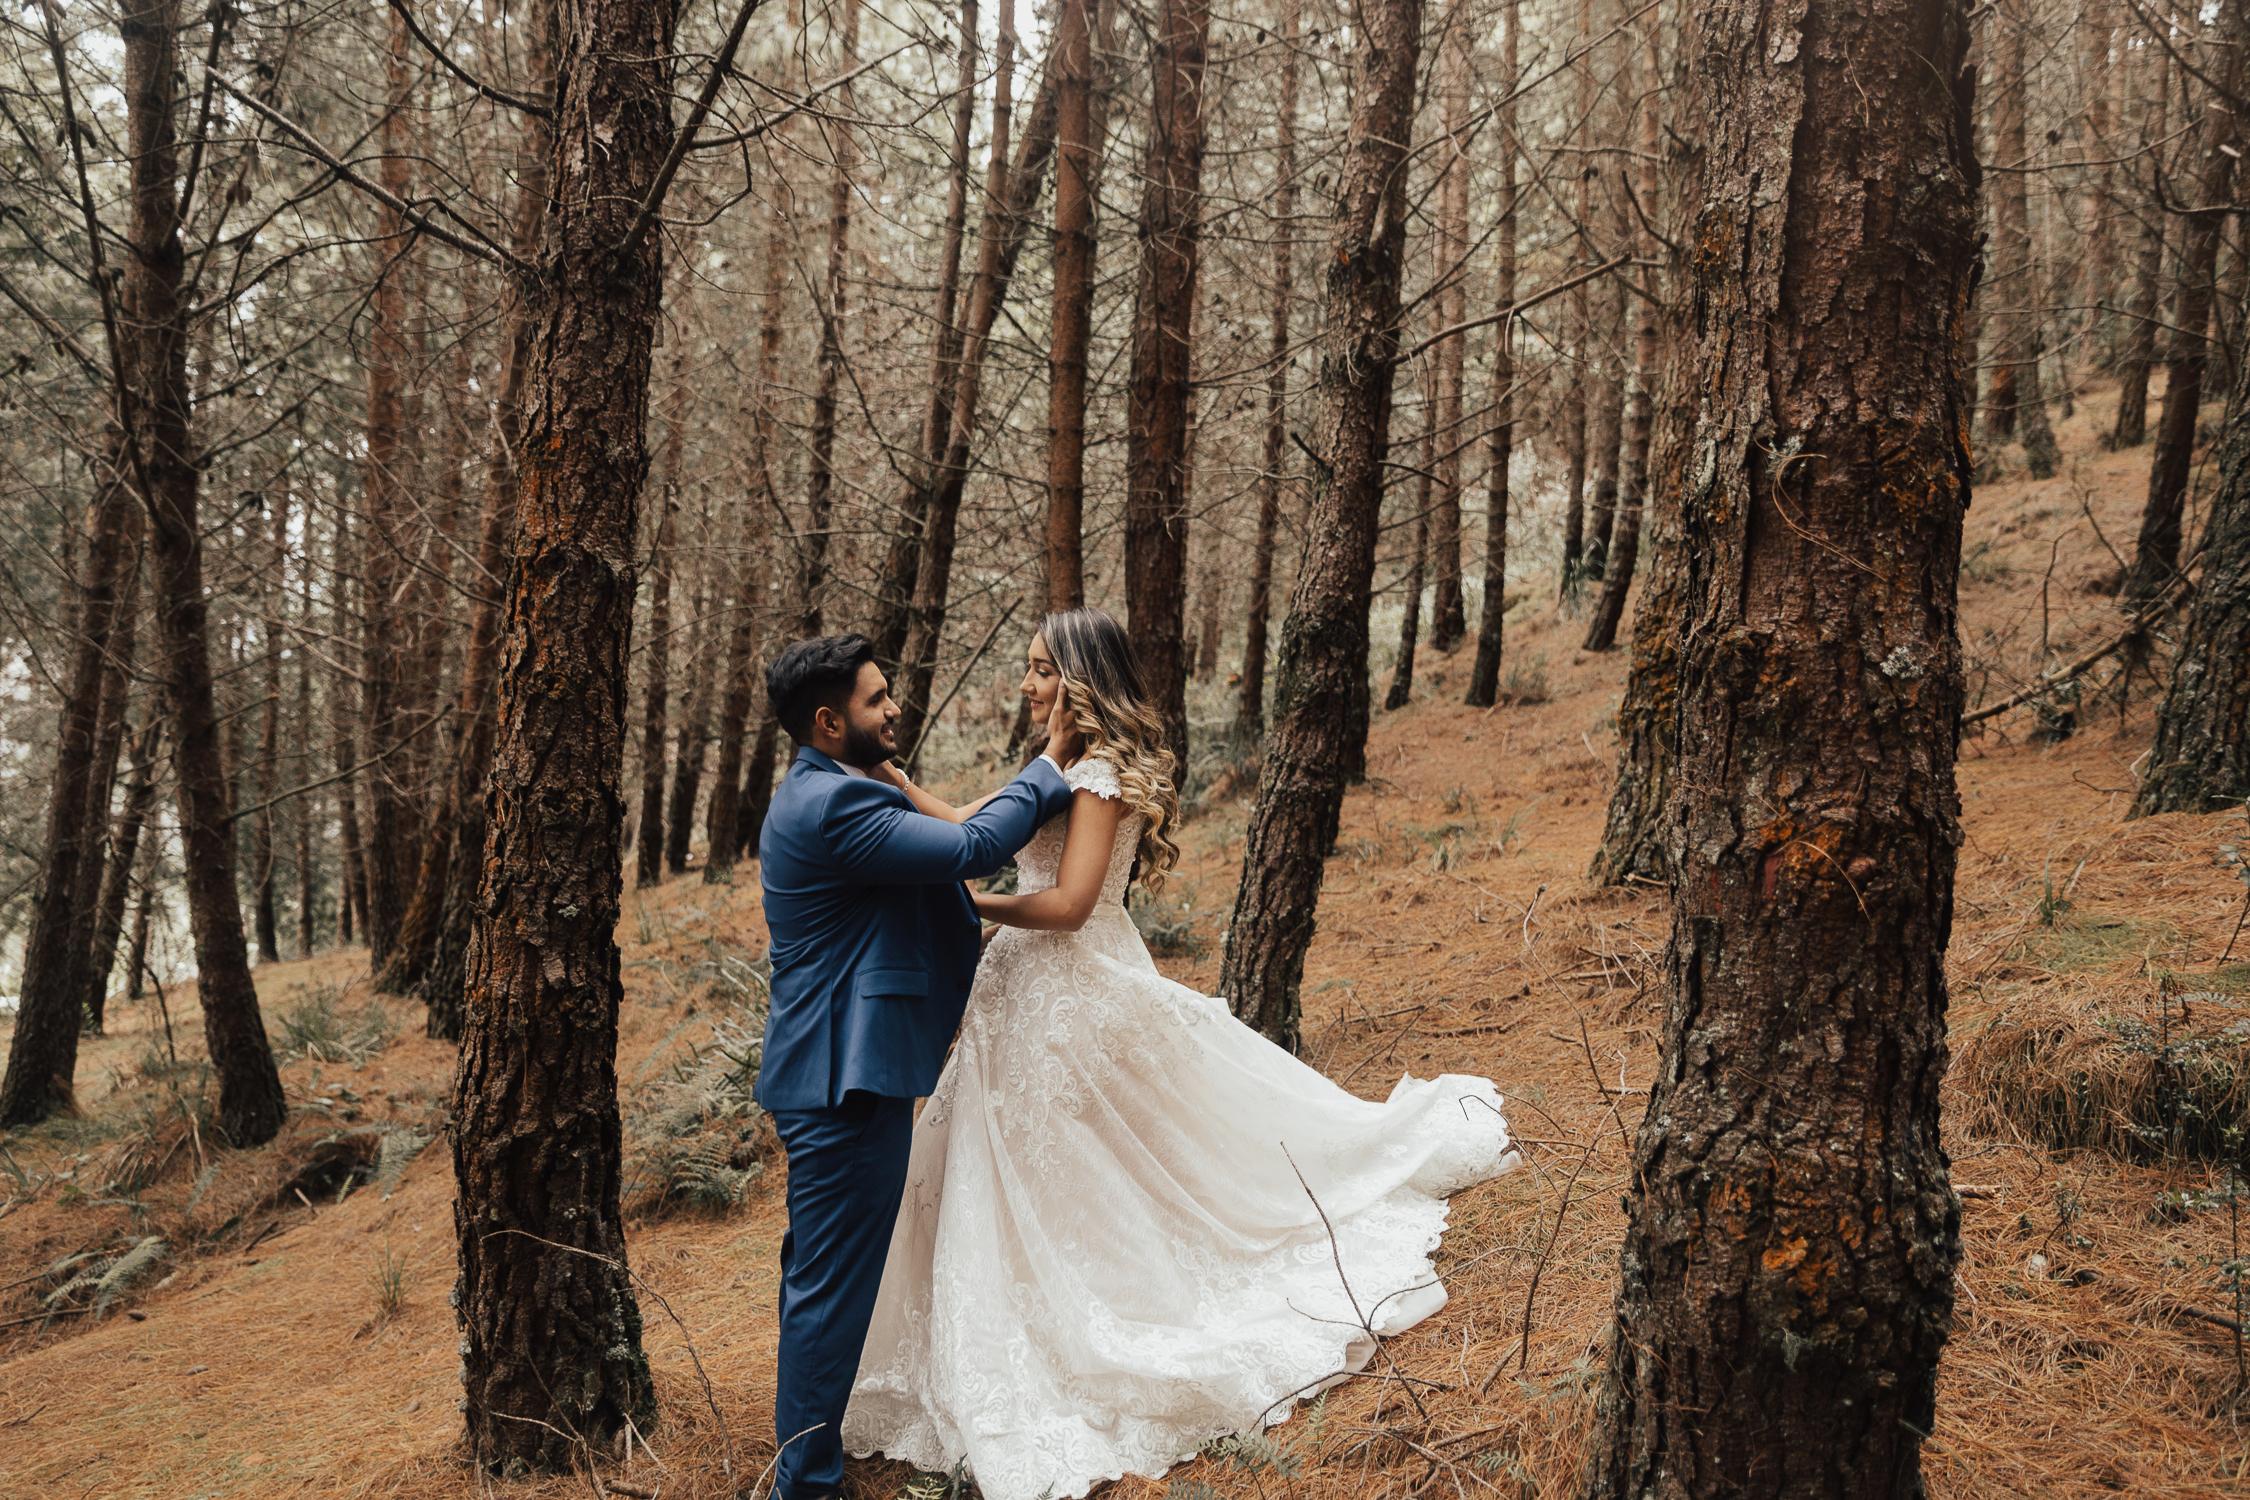 Michelle-Agurto-Fotografia-Bodas-Destination-Wedding-Photographer-Ecuador-Sesion-Johanna-Eduardo-19.JPG